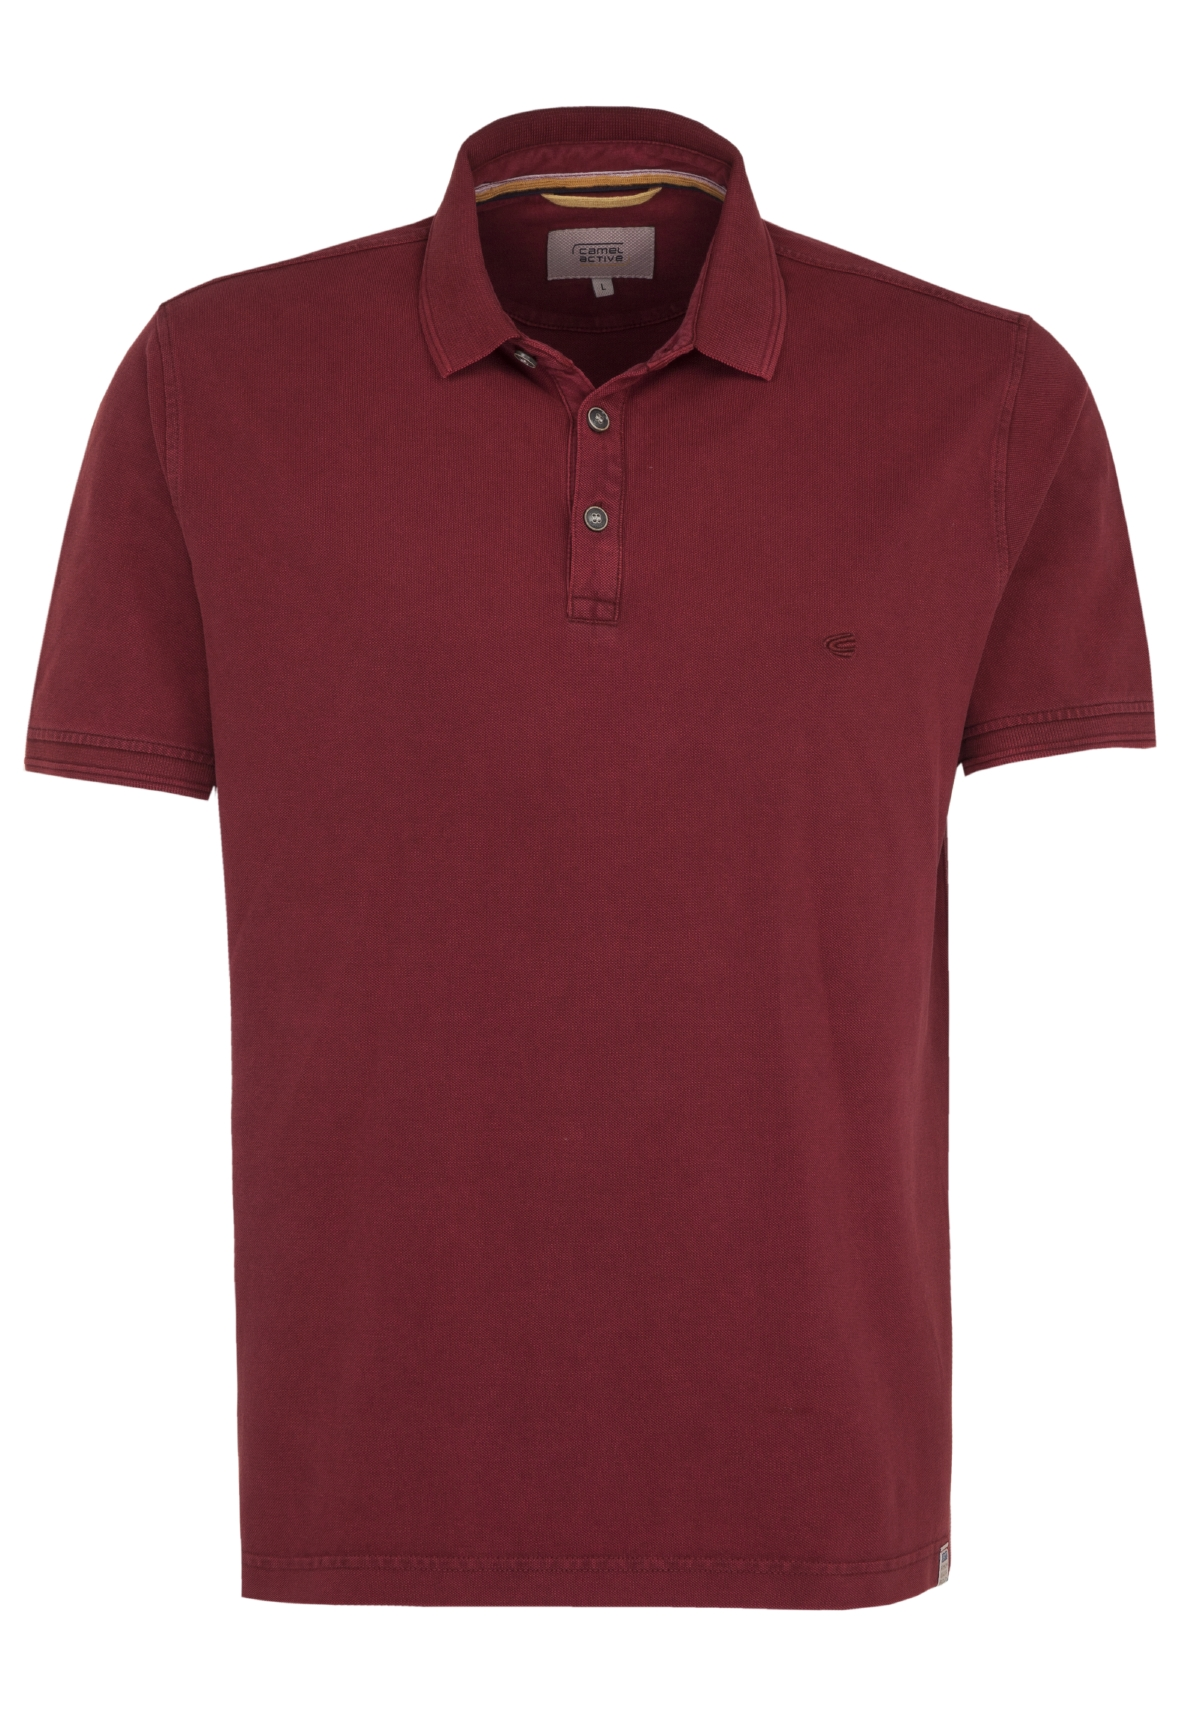 Camel-Active-Herren-Shirt-Poloshirt-Pique-Regular-Fit-NEU Indexbild 52